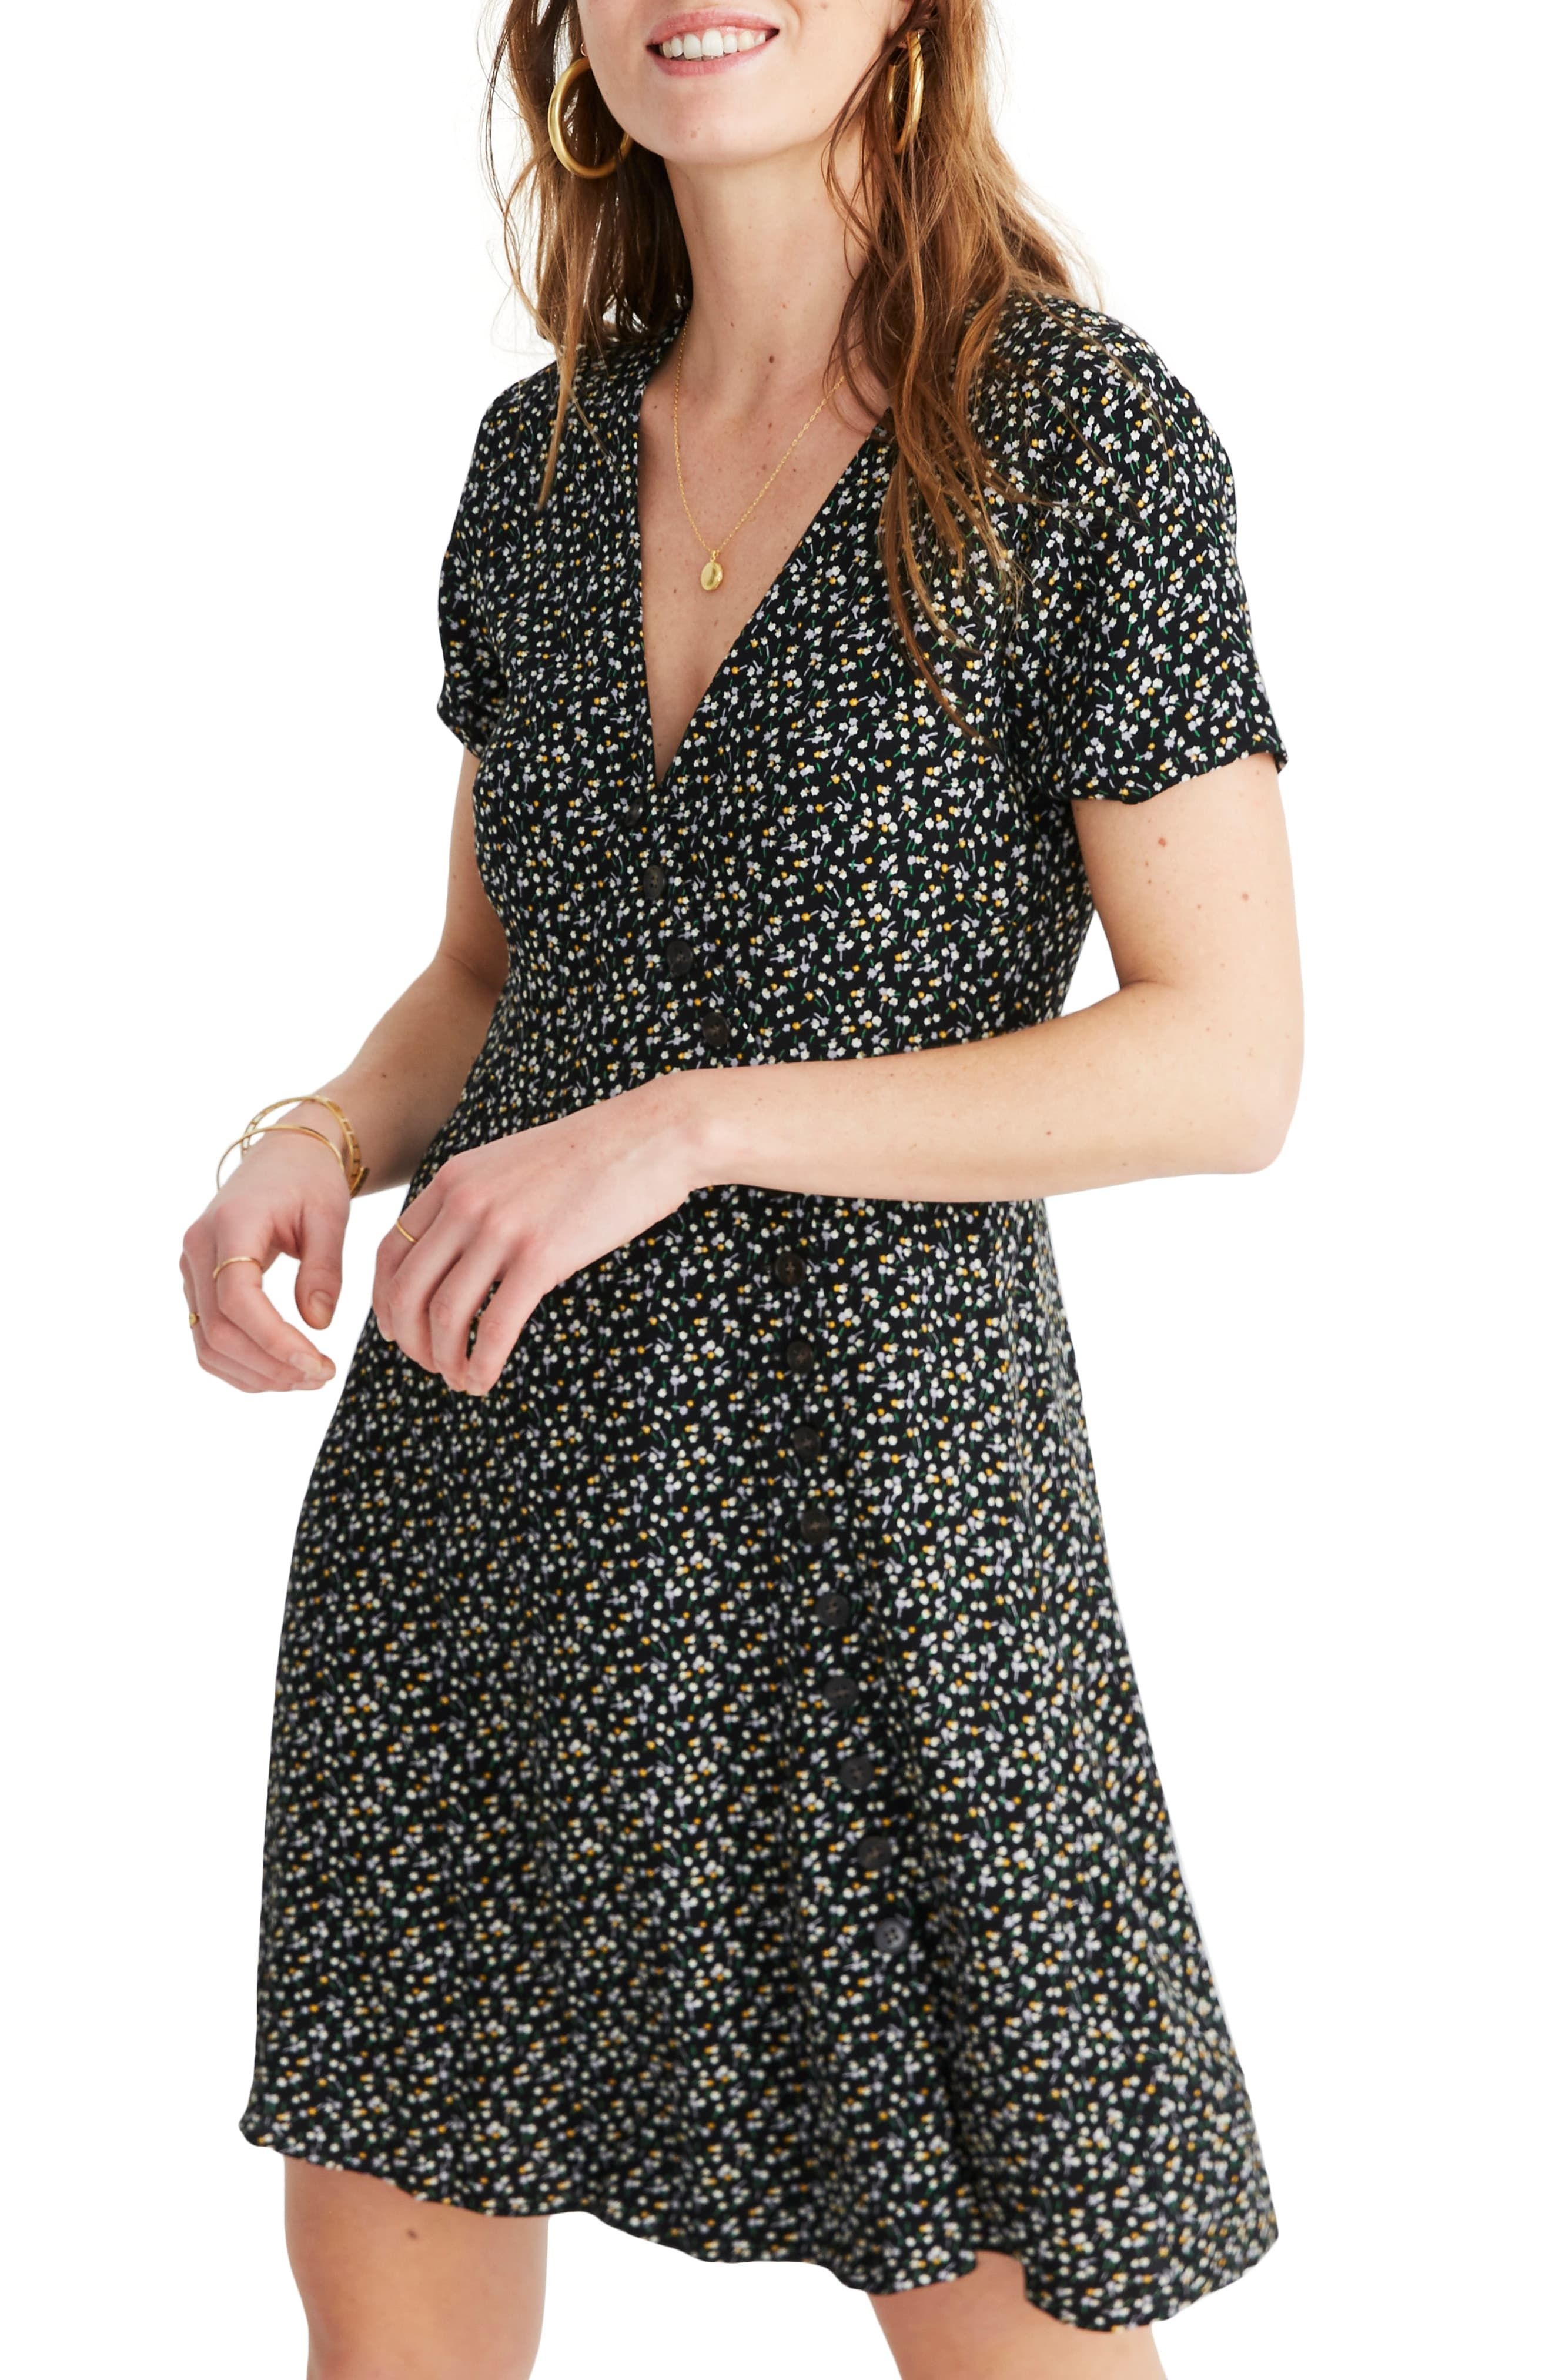 d6064d26a63f6 Women's Madewell Button Wrap Dress, Size 22 (similar to 20W-22W) - Black